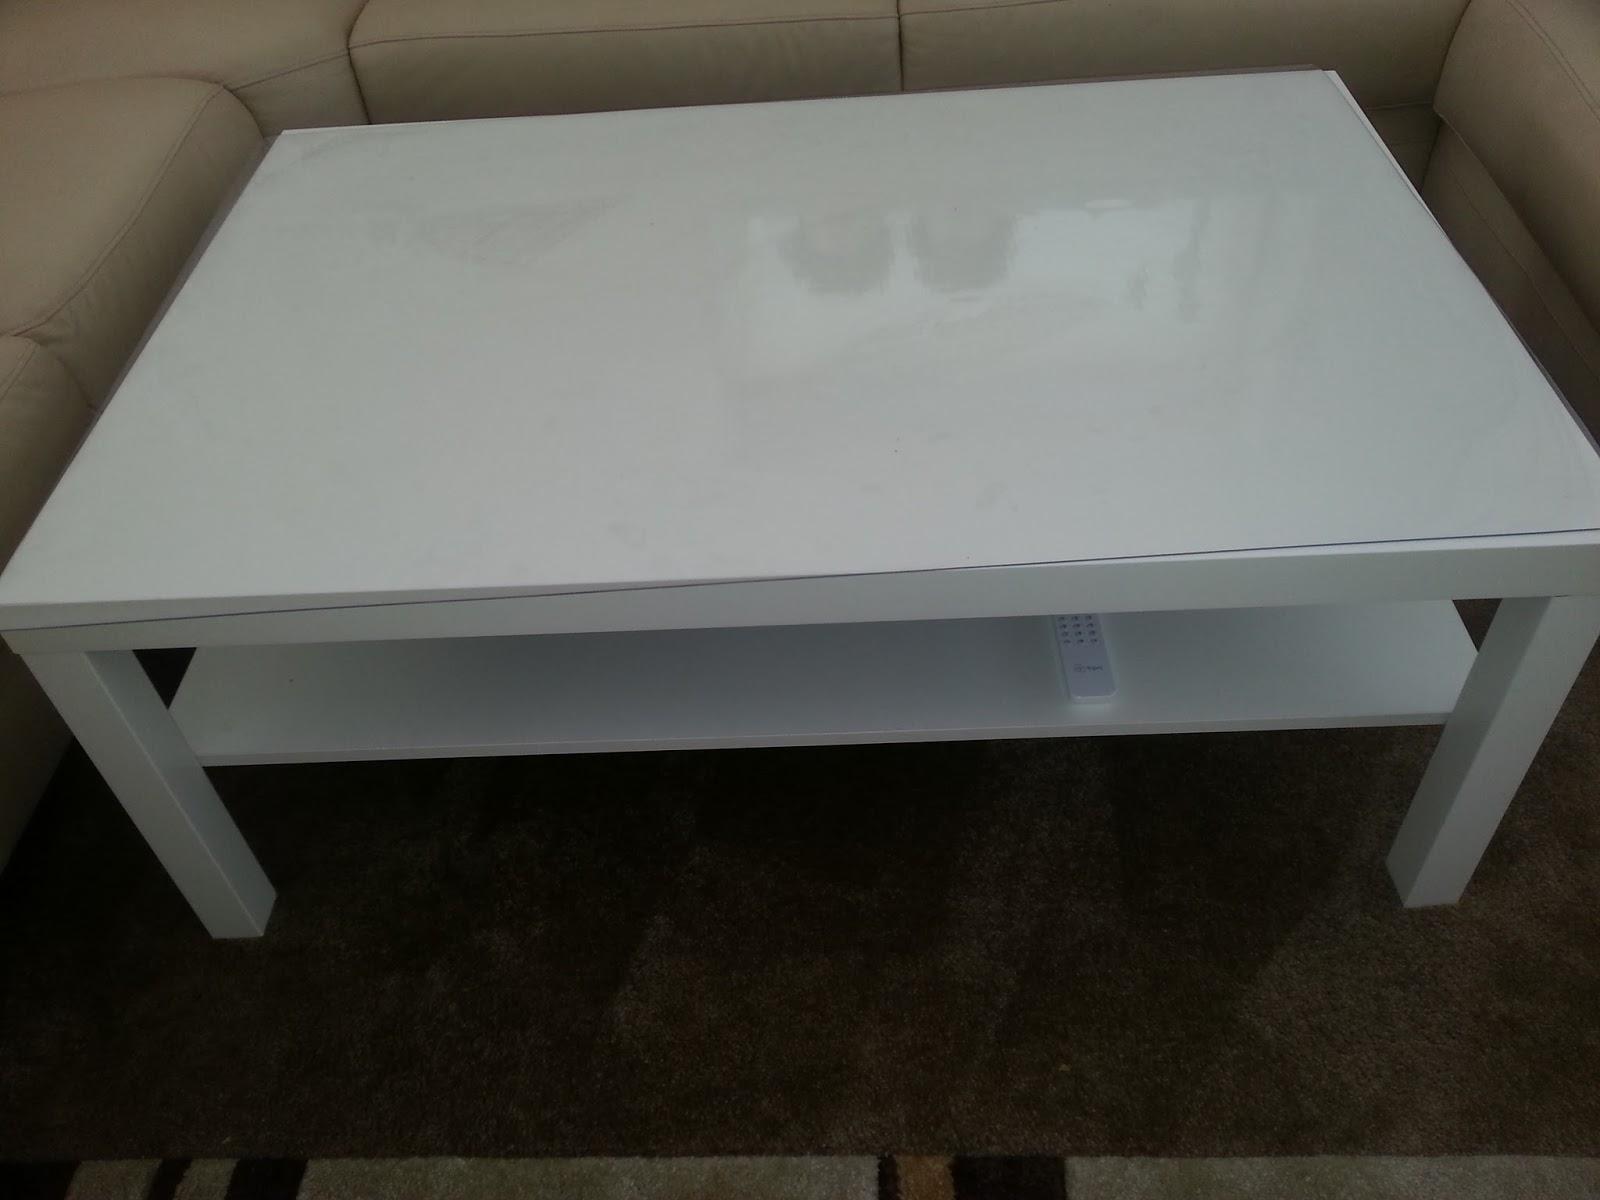 Computermeubel Wit Ikea.Ikea Witte Tafel